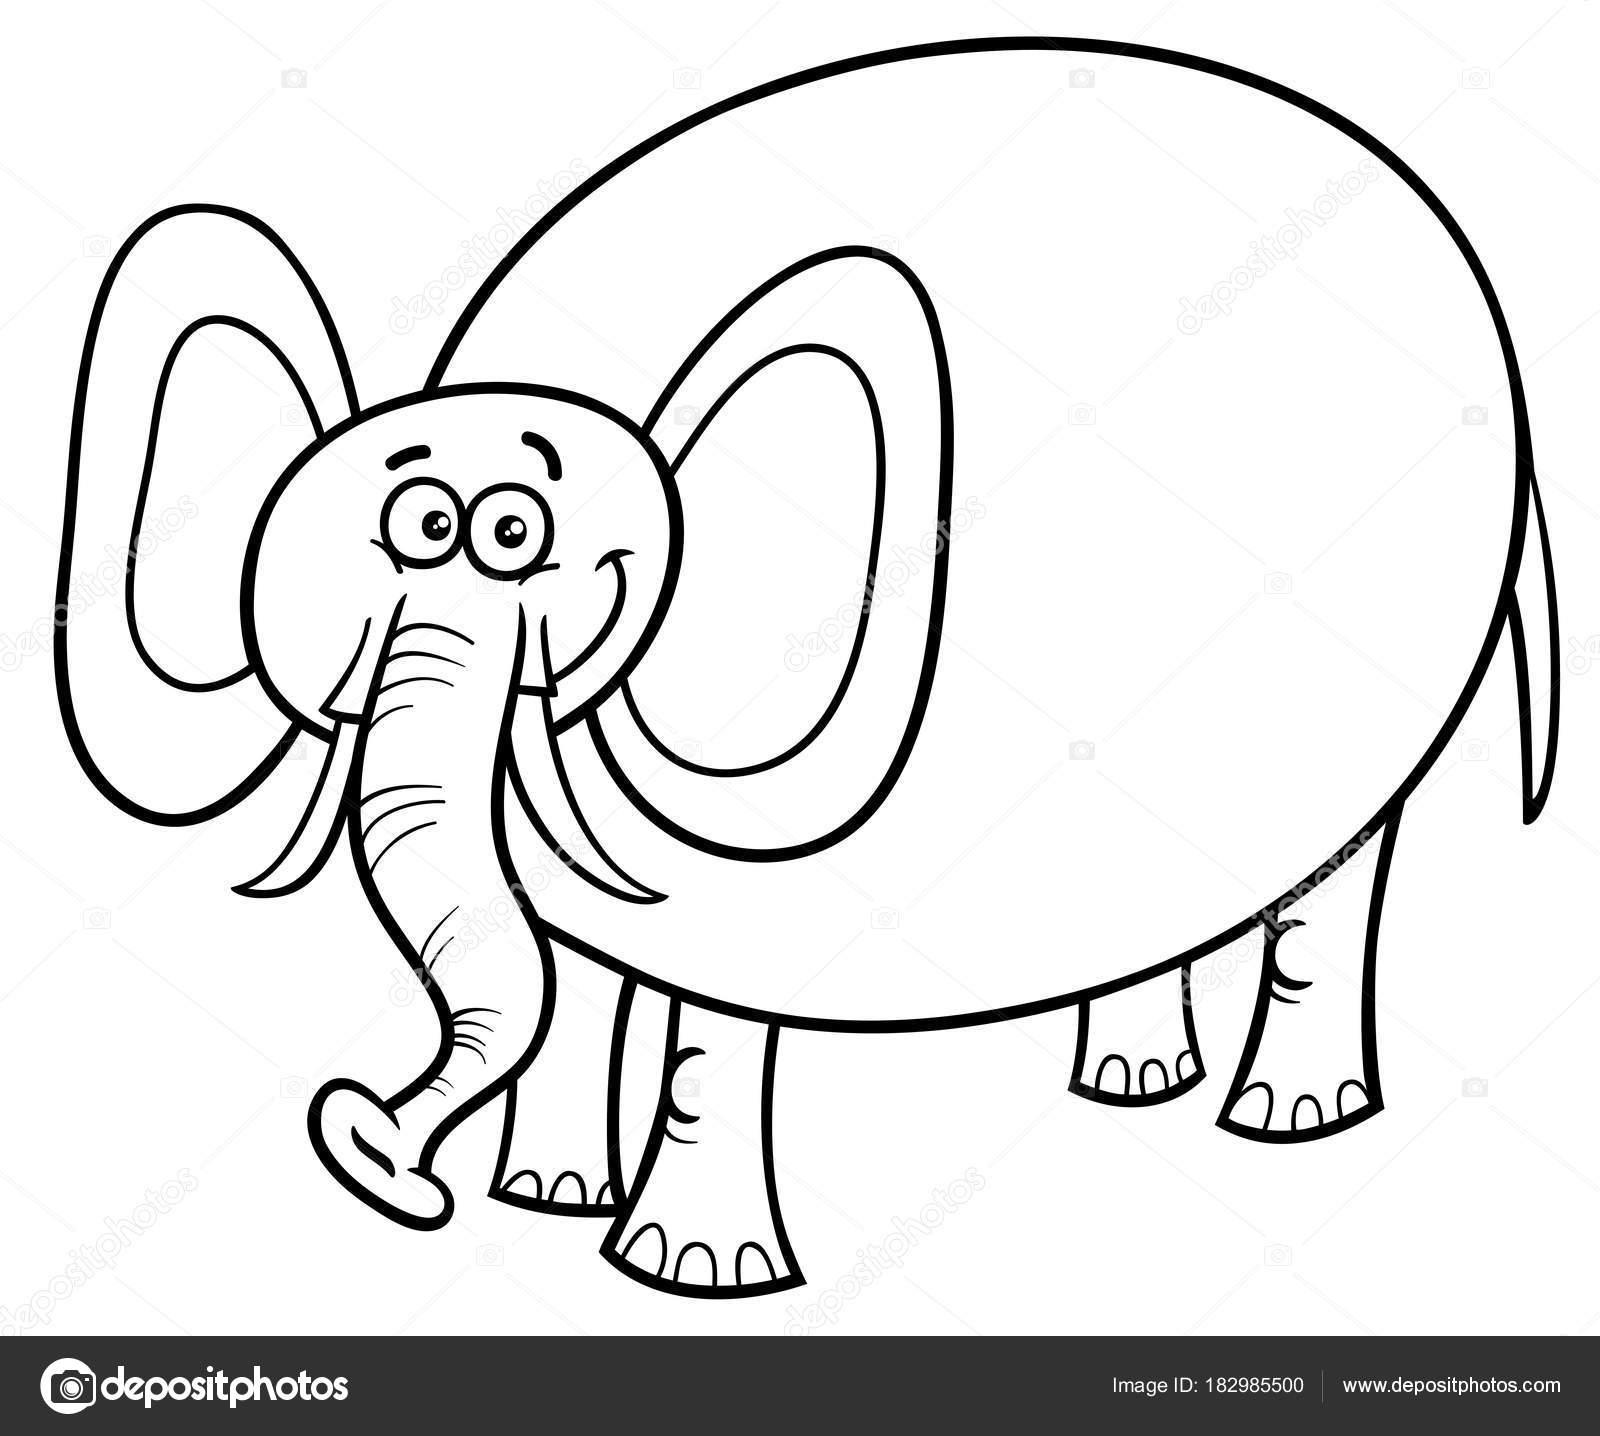 Niedlichen Elefanten Cartoon Charakter Malbuch Stockvektor